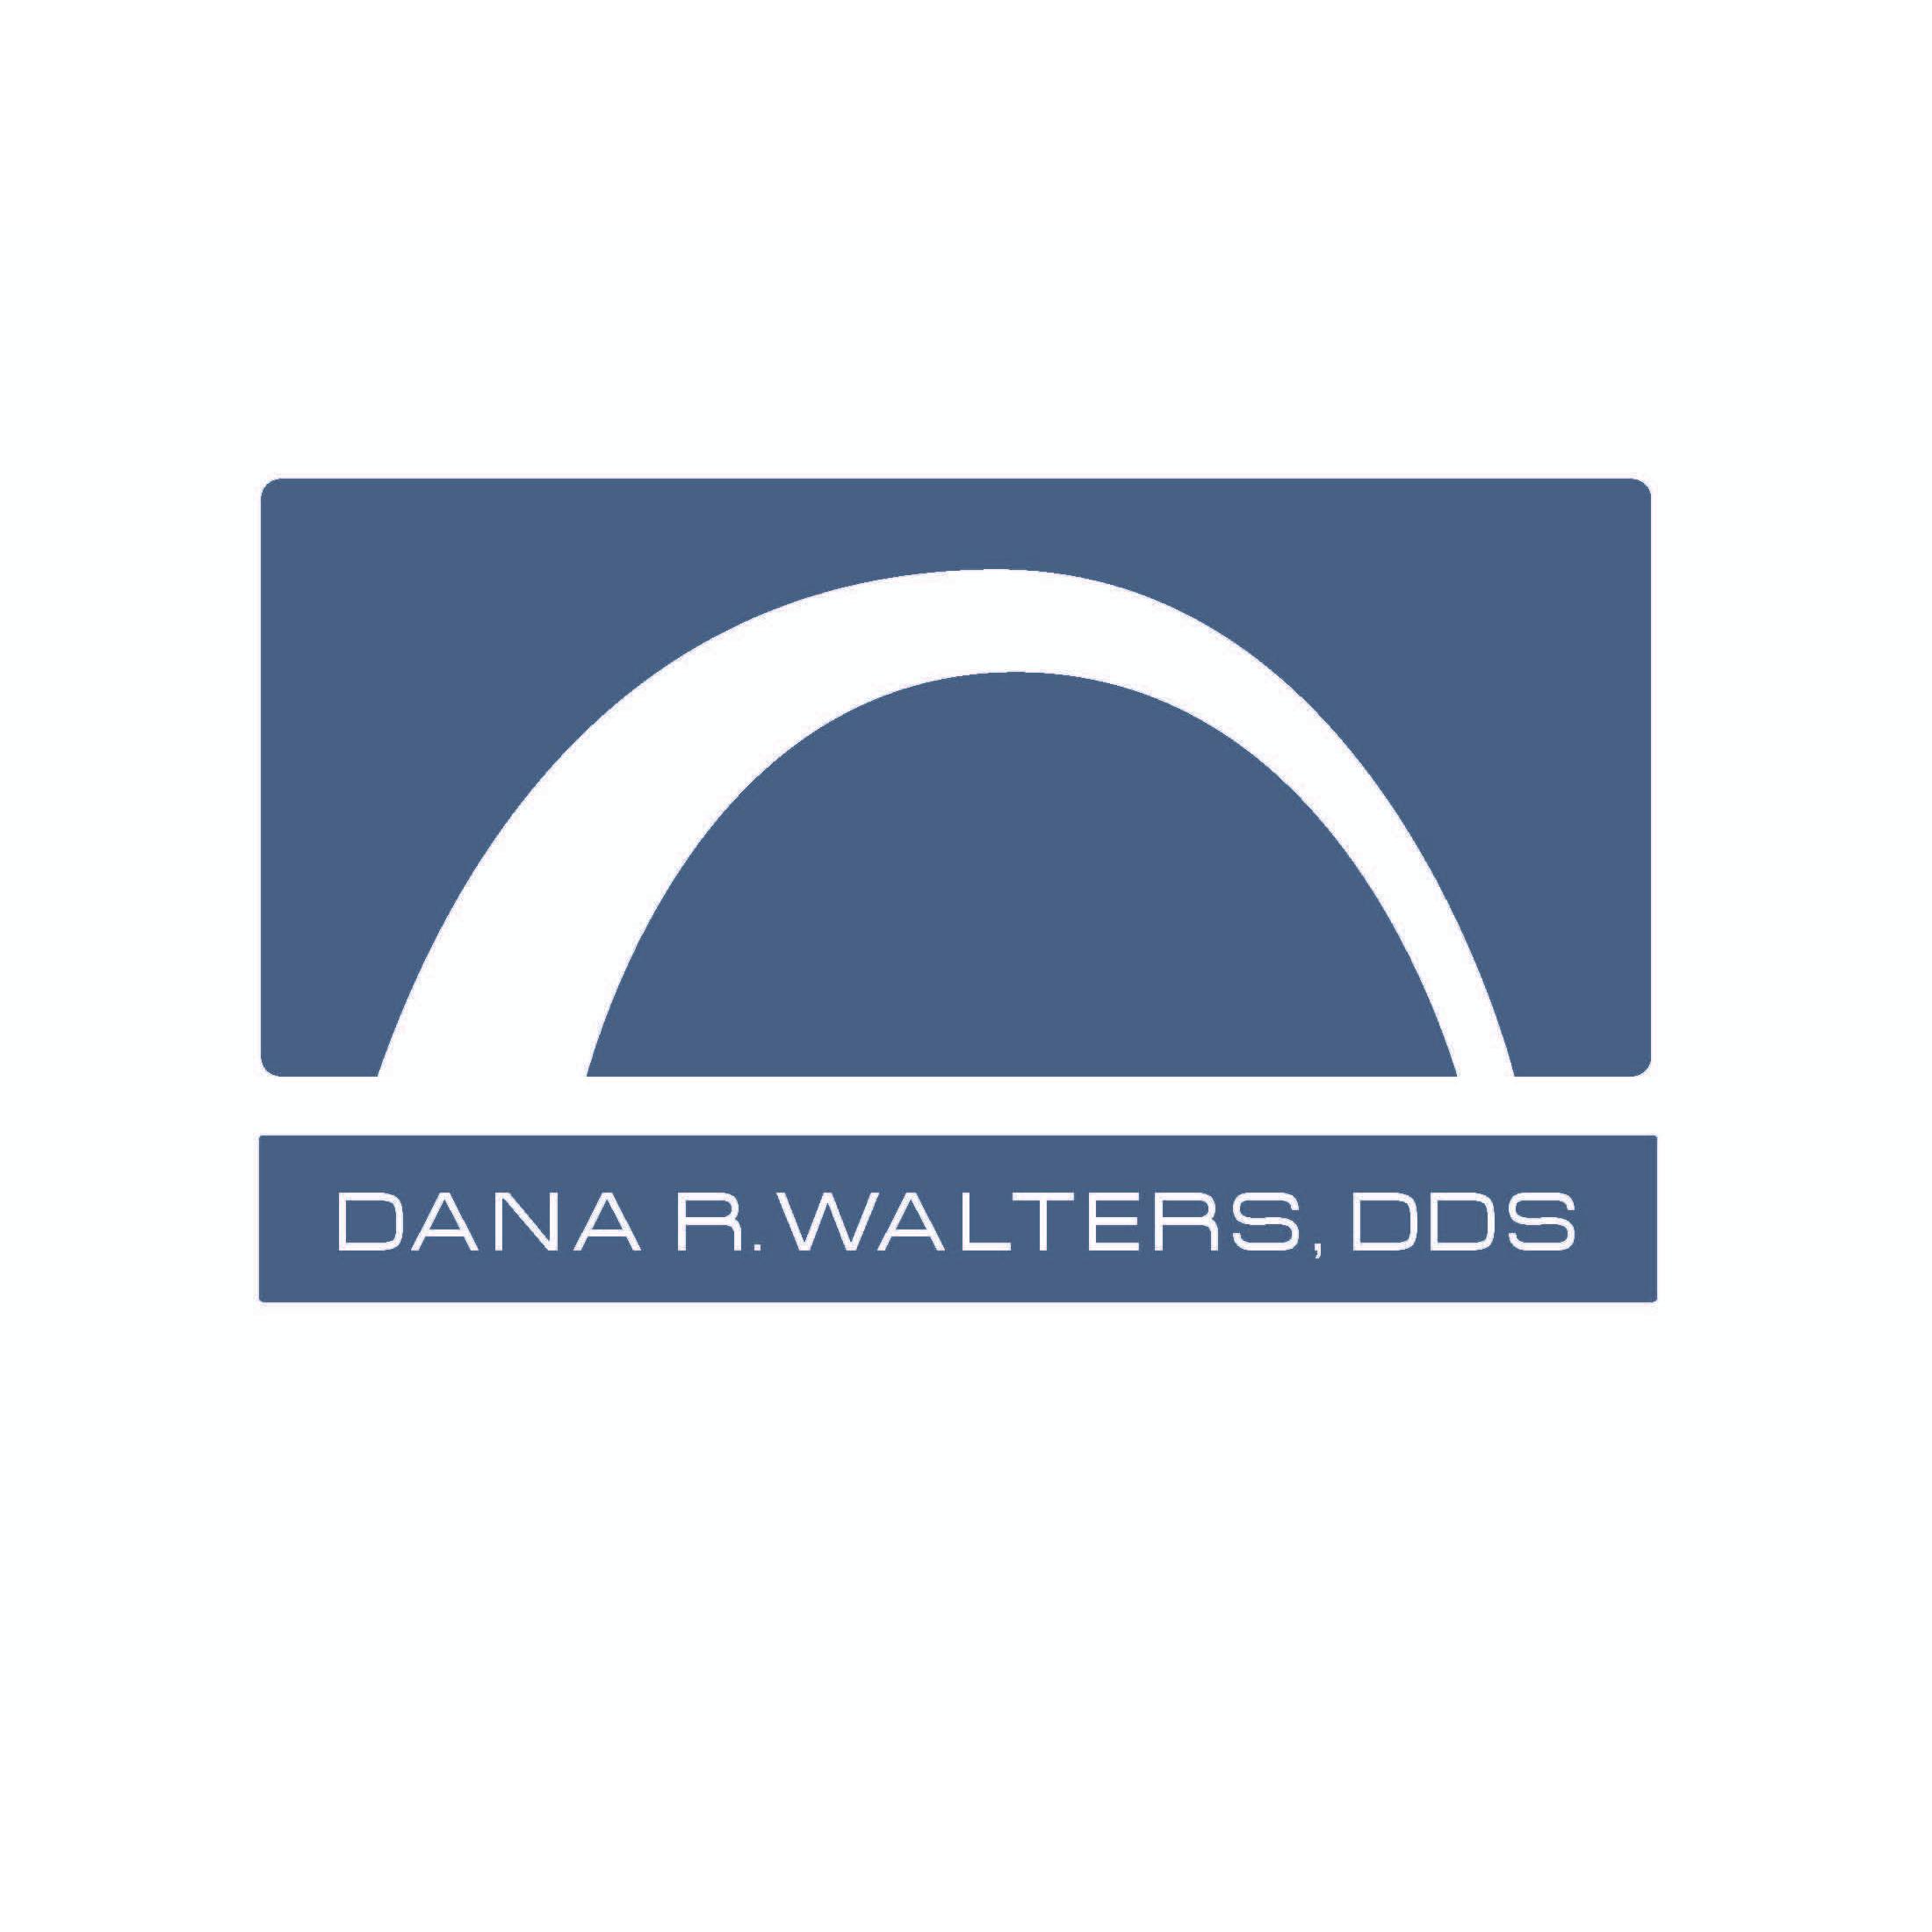 Dana R. Walters, DDS image 3